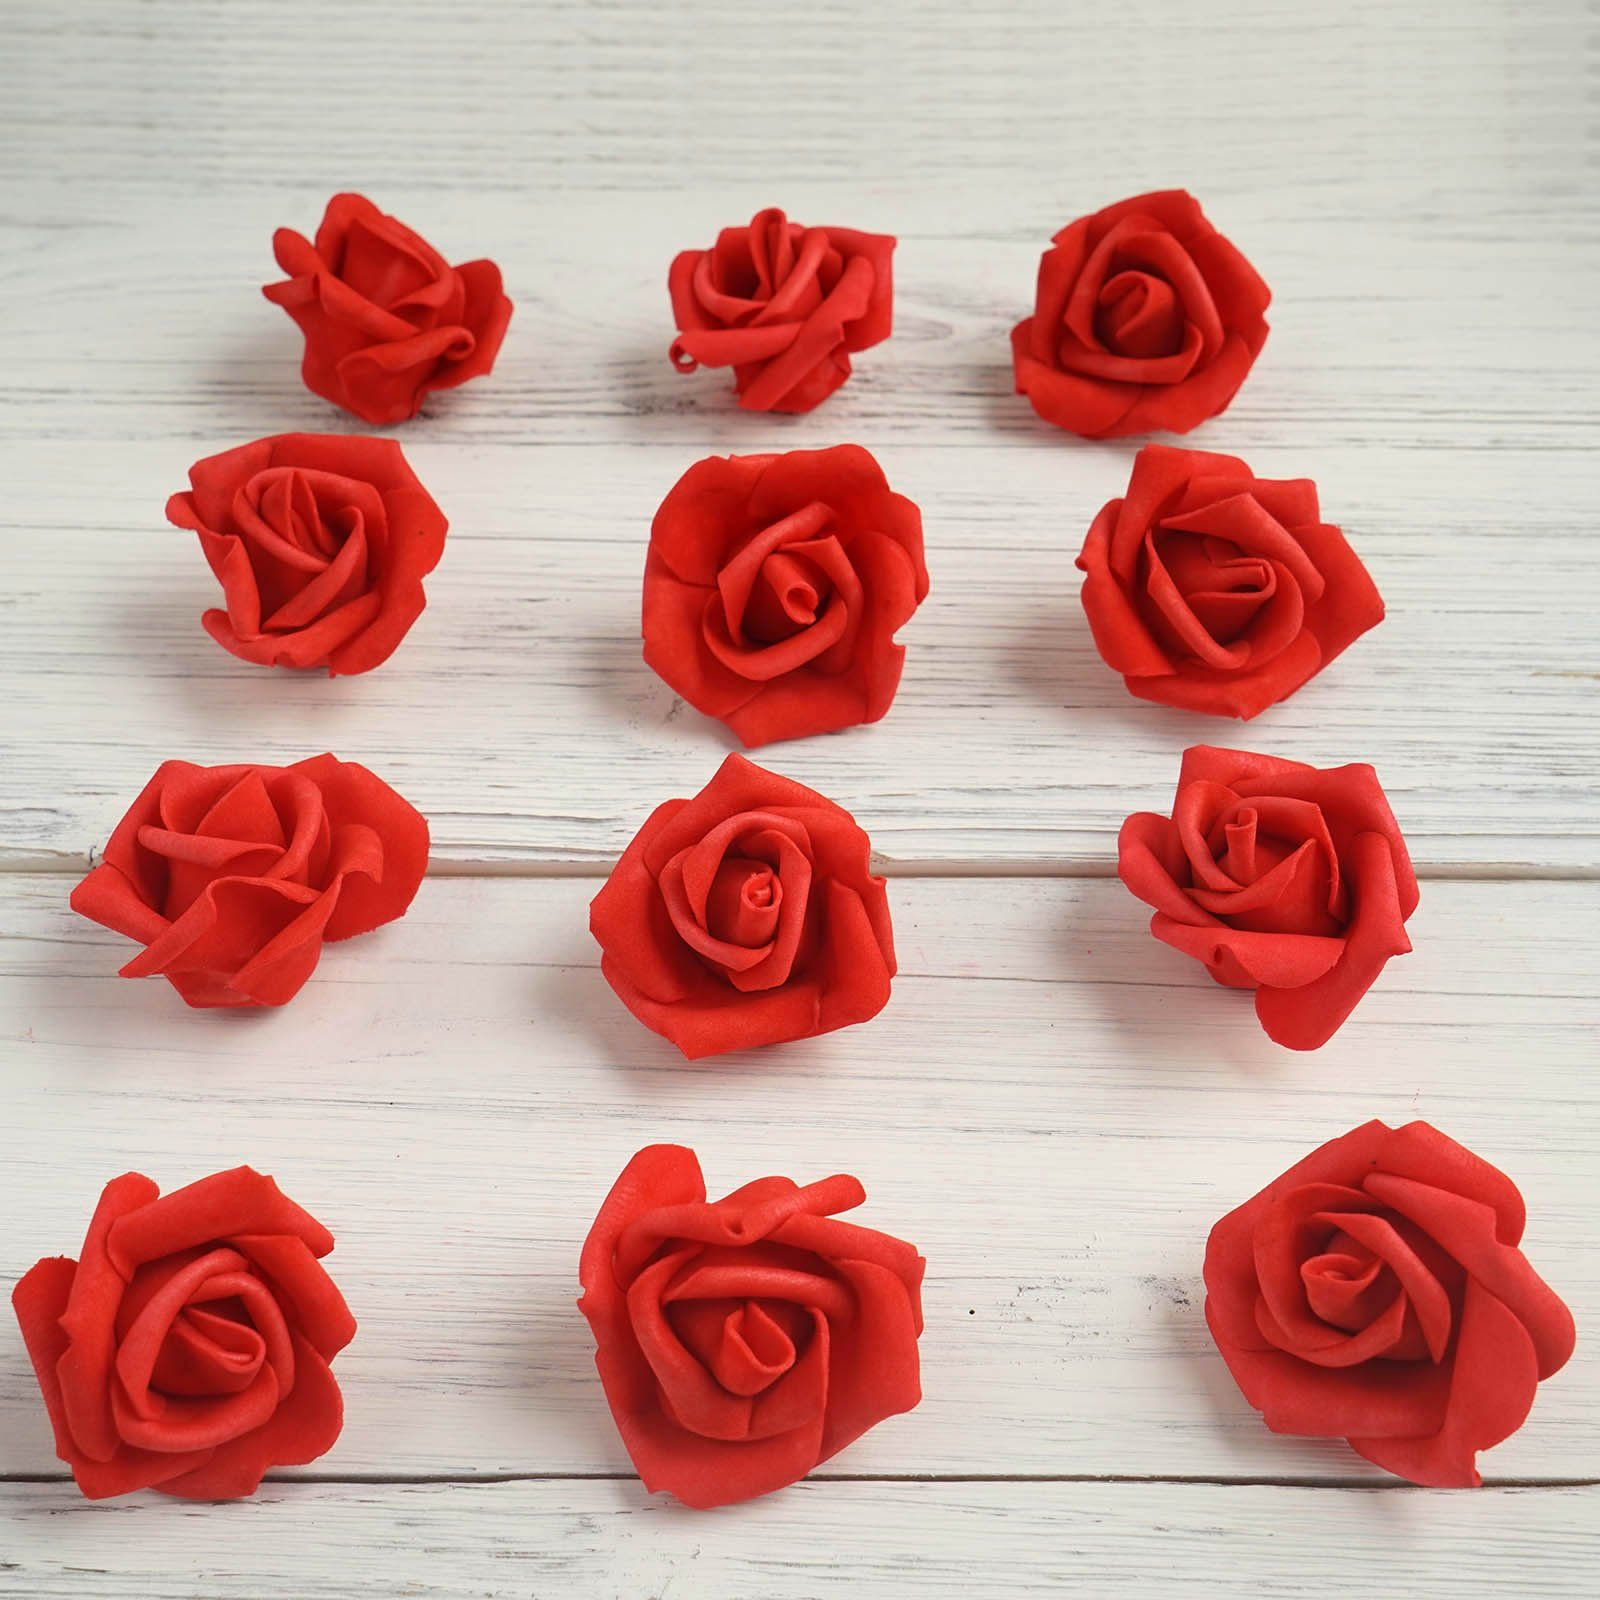 12 Pcs 2 Red Real Touch 3d Artificial Diy Foam Rose Flower Head Foam Roses Flowers Making A Bouquet